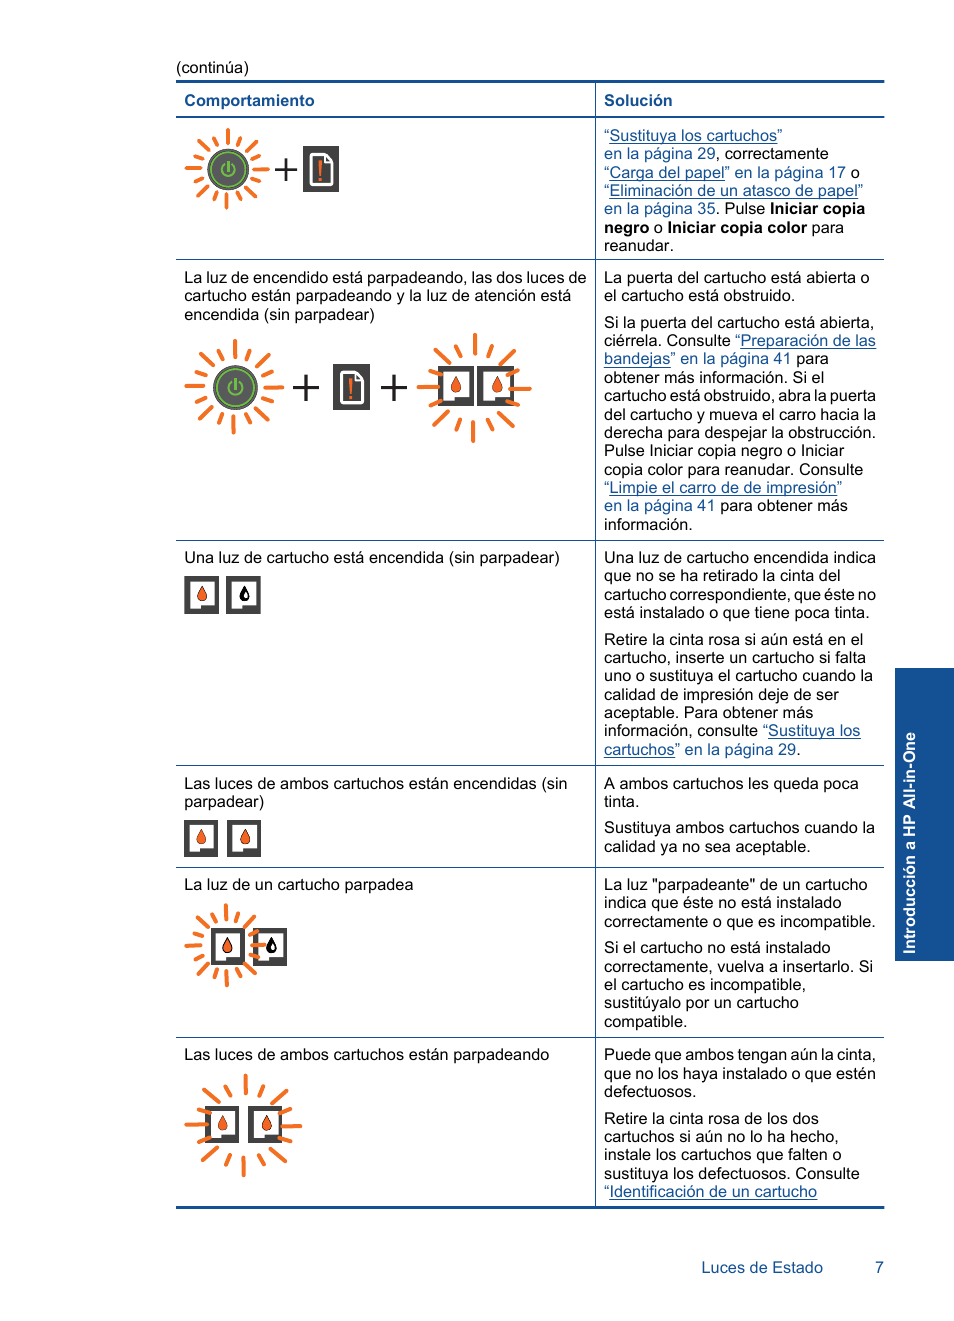 HP Deskjet 2050 Manual del usuario | Página 9 / 56 | Original